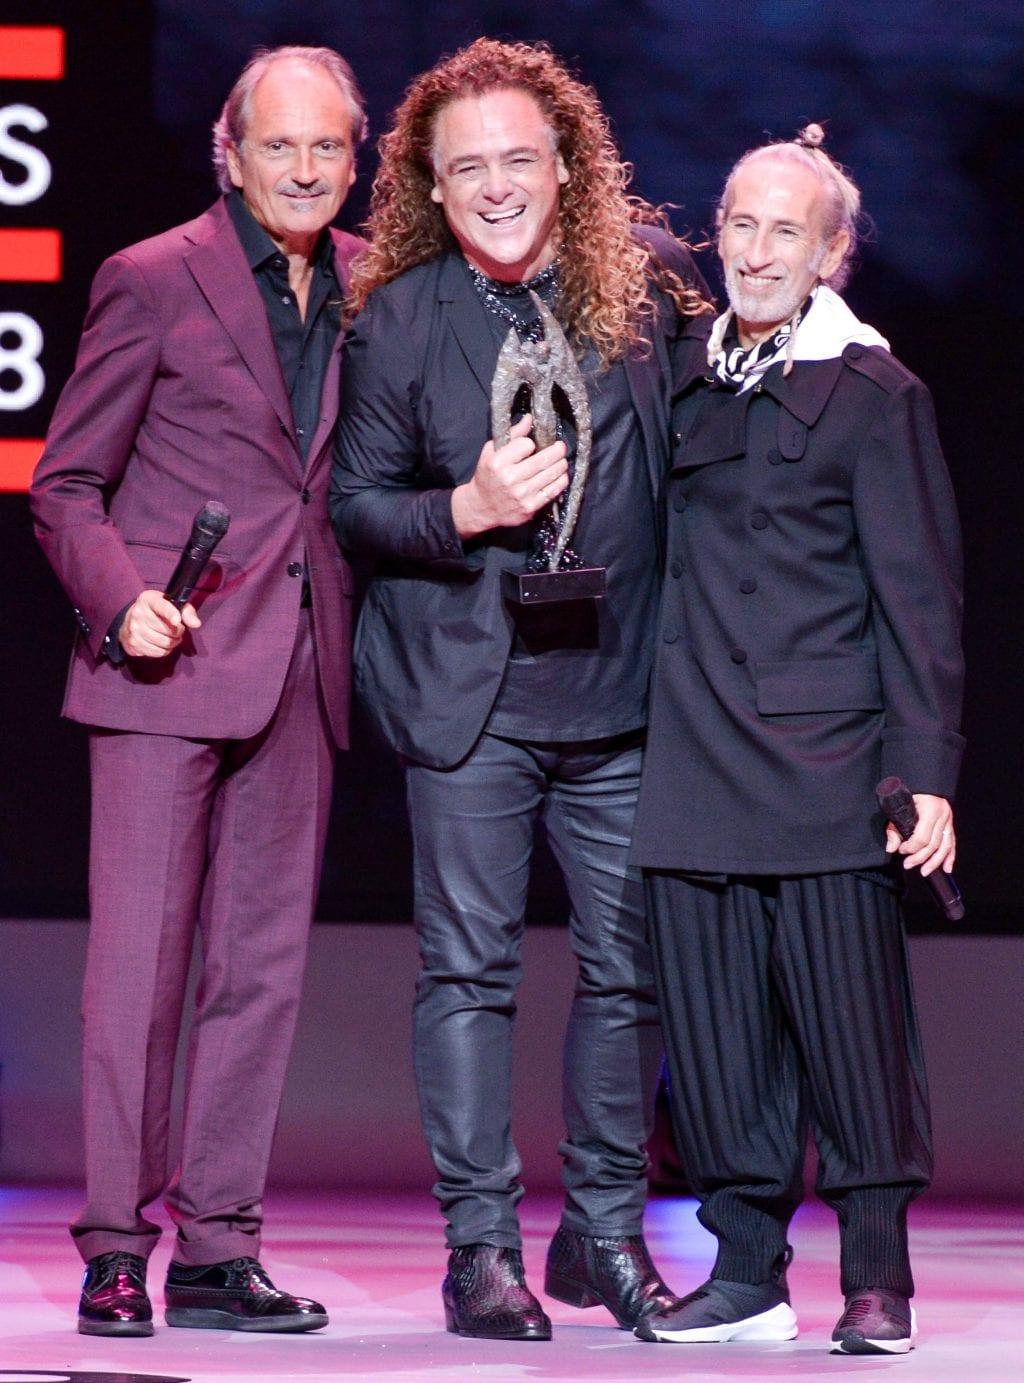 Patrick Cameron receiving the Legend Award